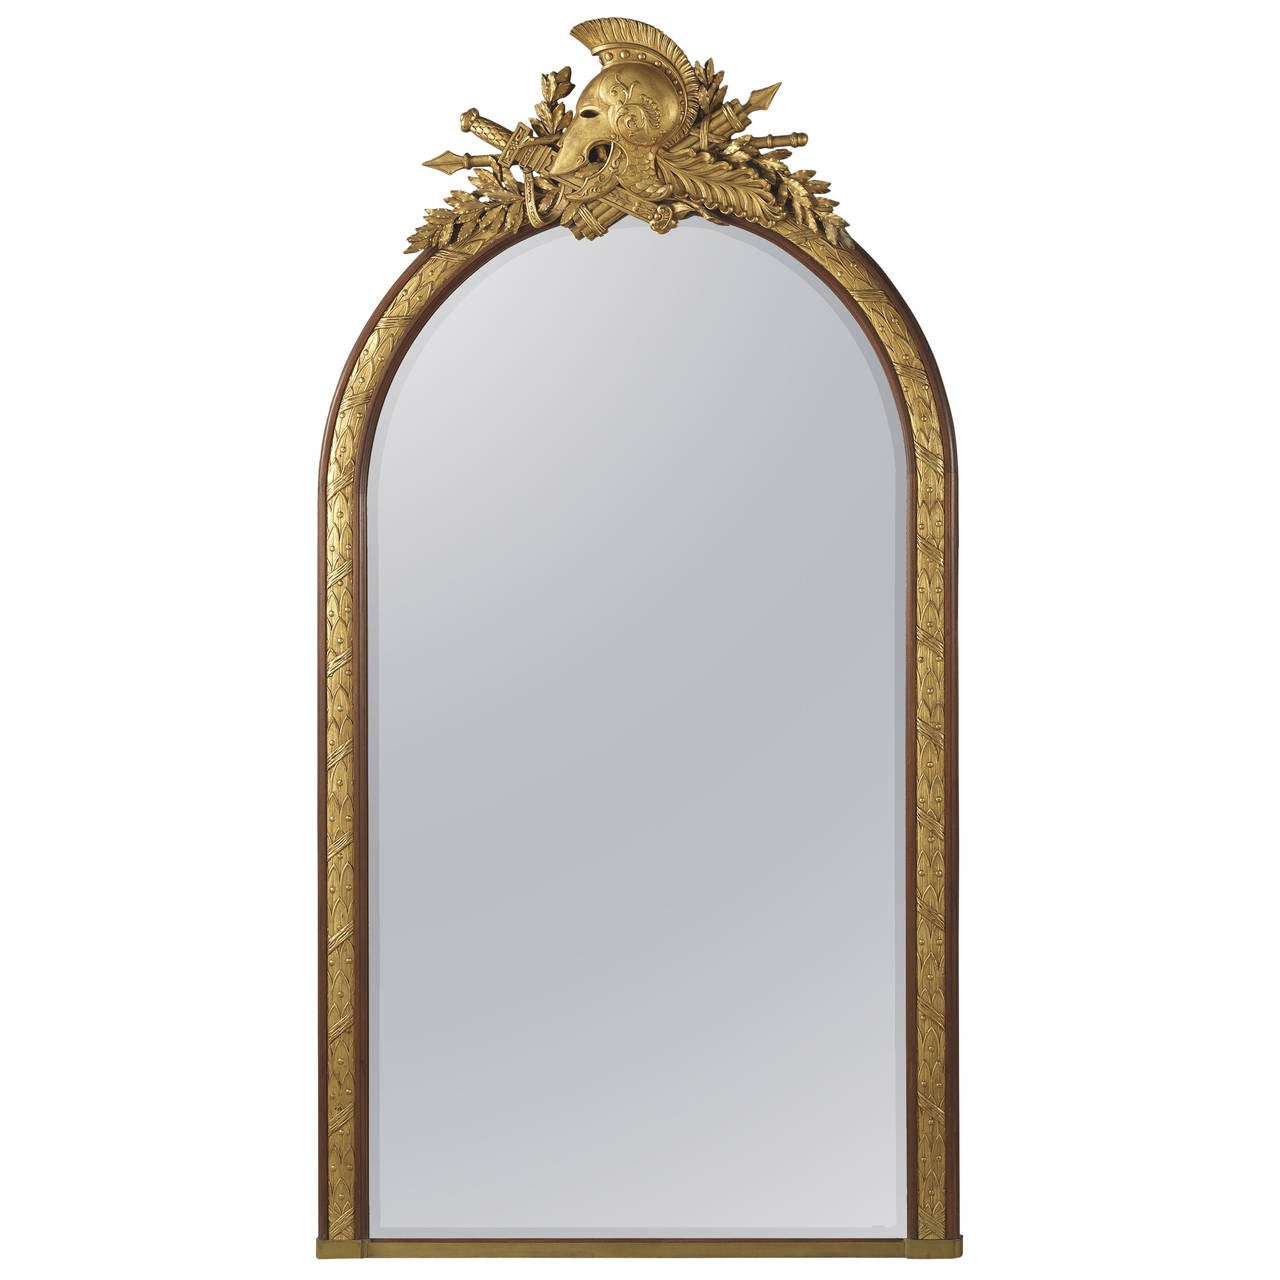 Empire Style Mirror by Alix A Paris